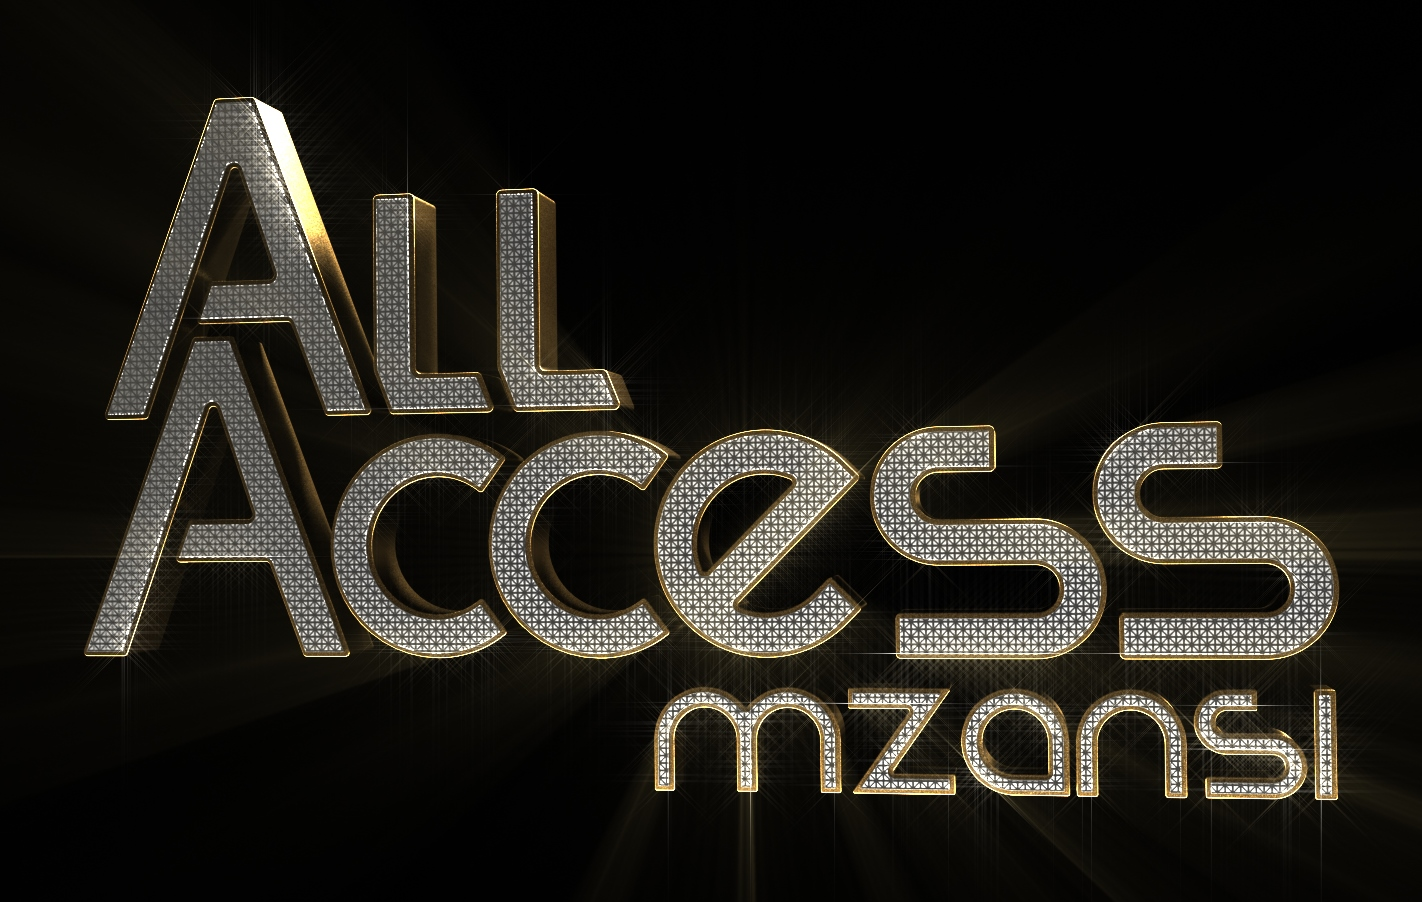 A third season of the rebooted All Access Mzansi starts tonight on Mzansi  Magic (DStv 161) at 21 30 7966cd537